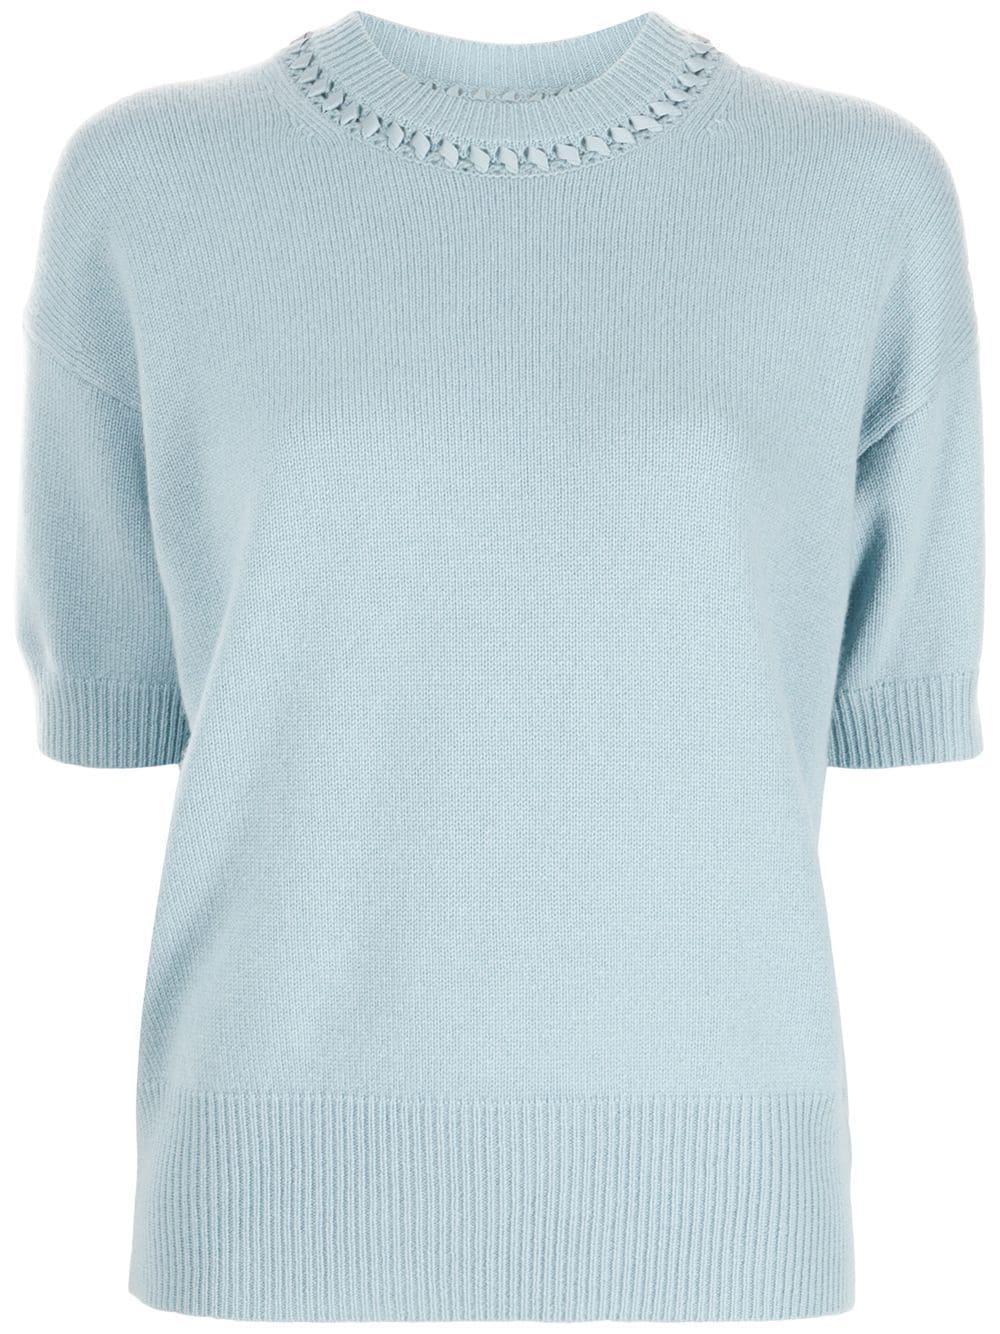 Ribbon Trim Cashmere Sweater